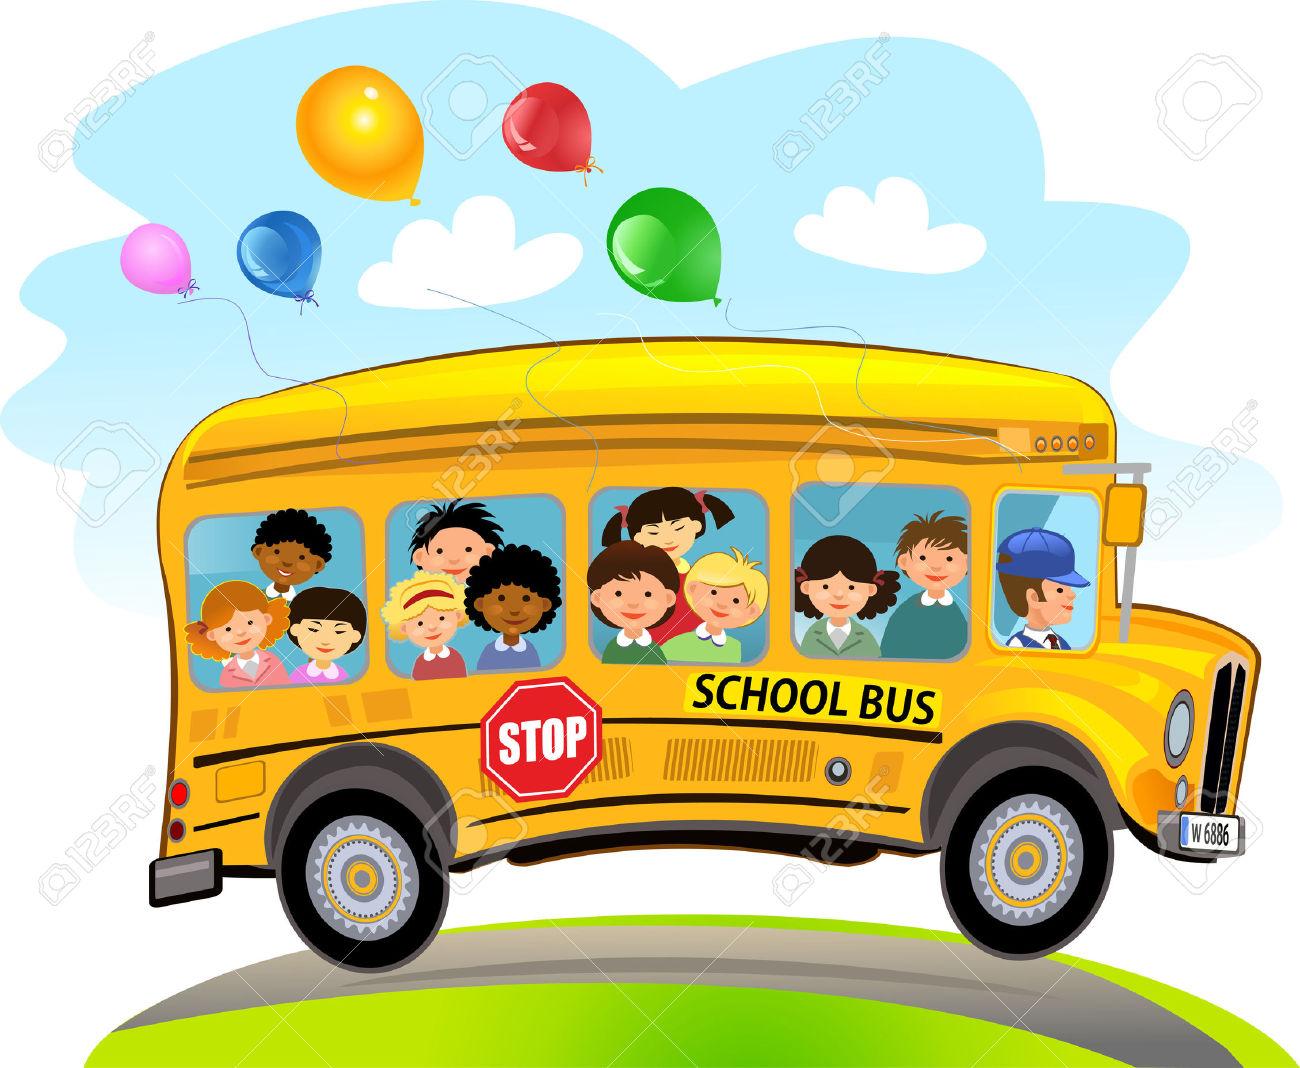 School bus kid. Animated free download best